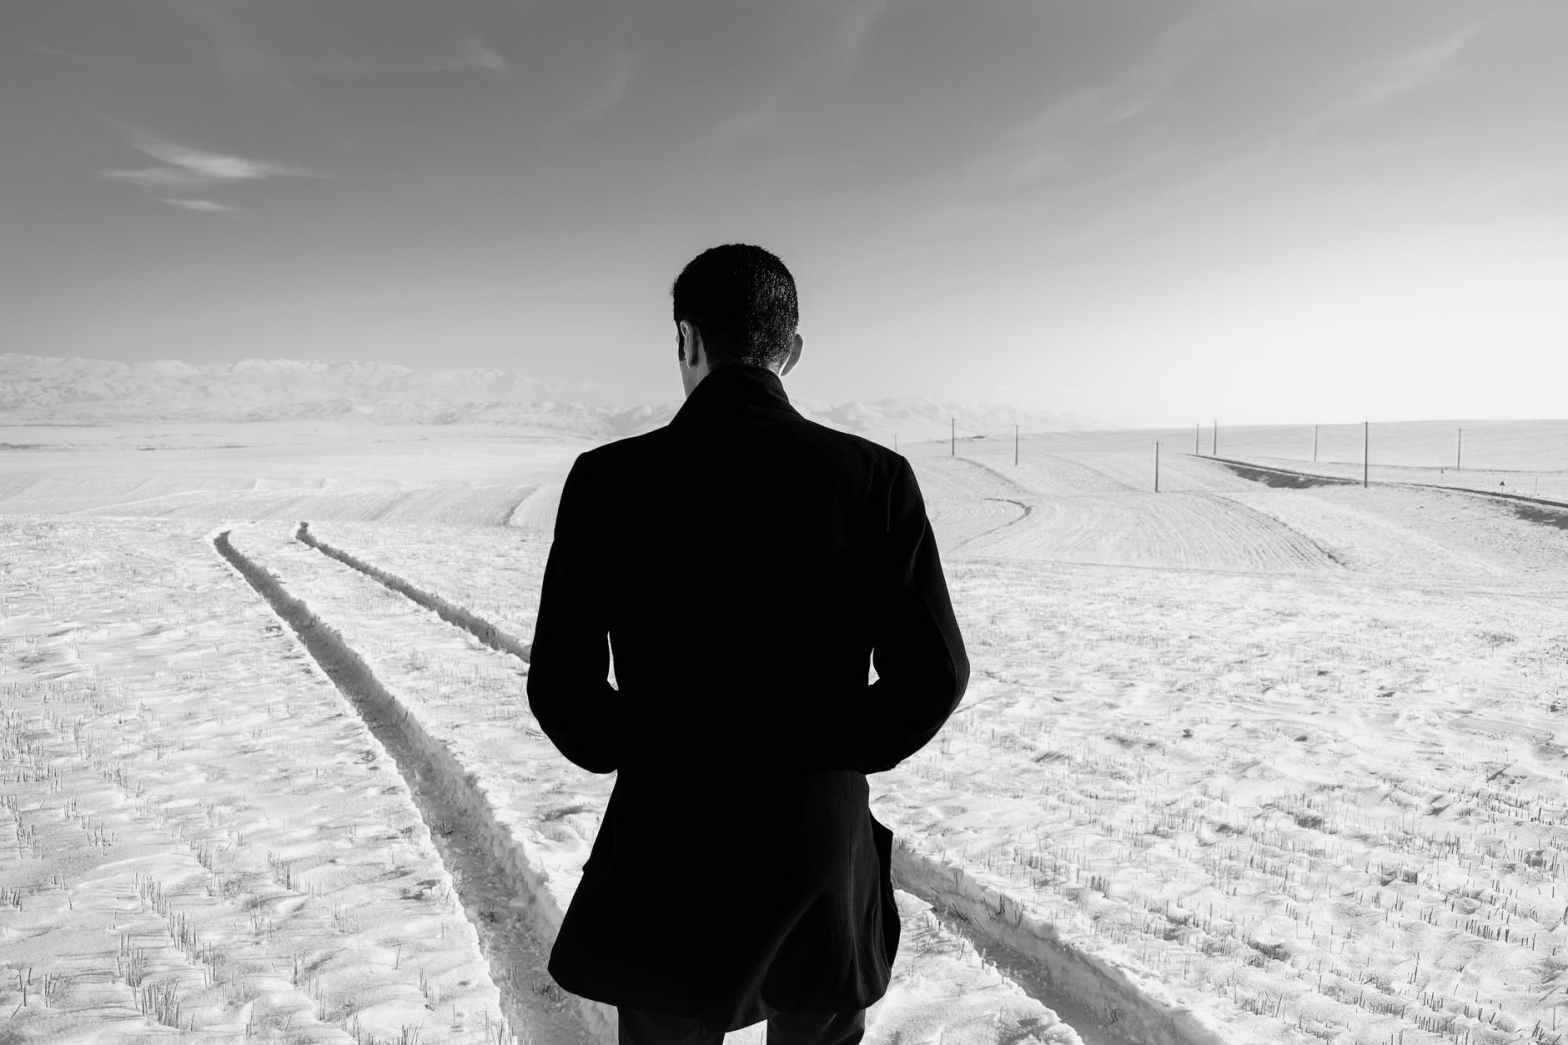 unrecognizable man in snowy field